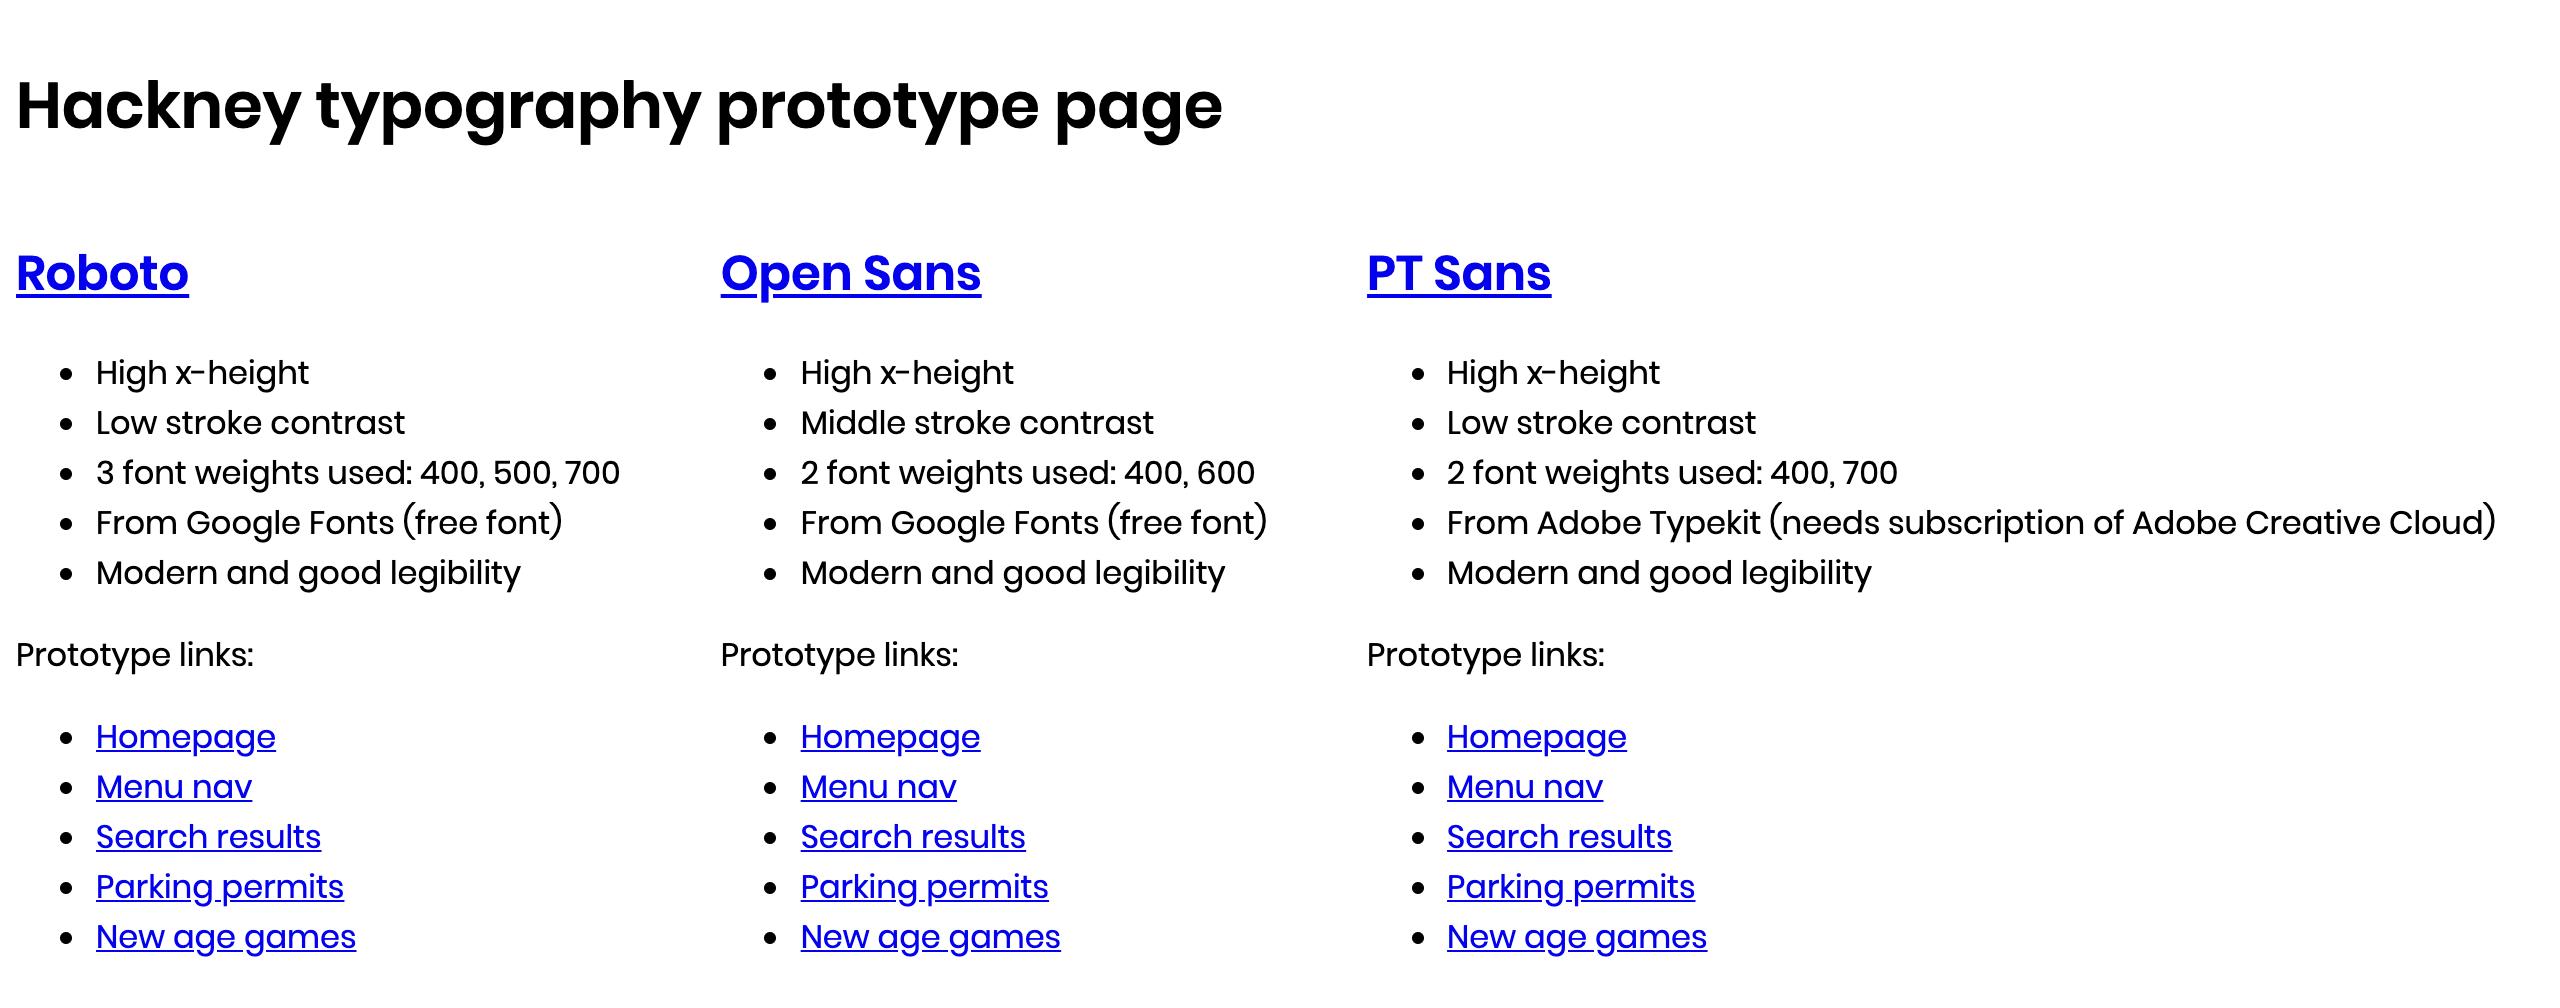 The prototype page on Heroku